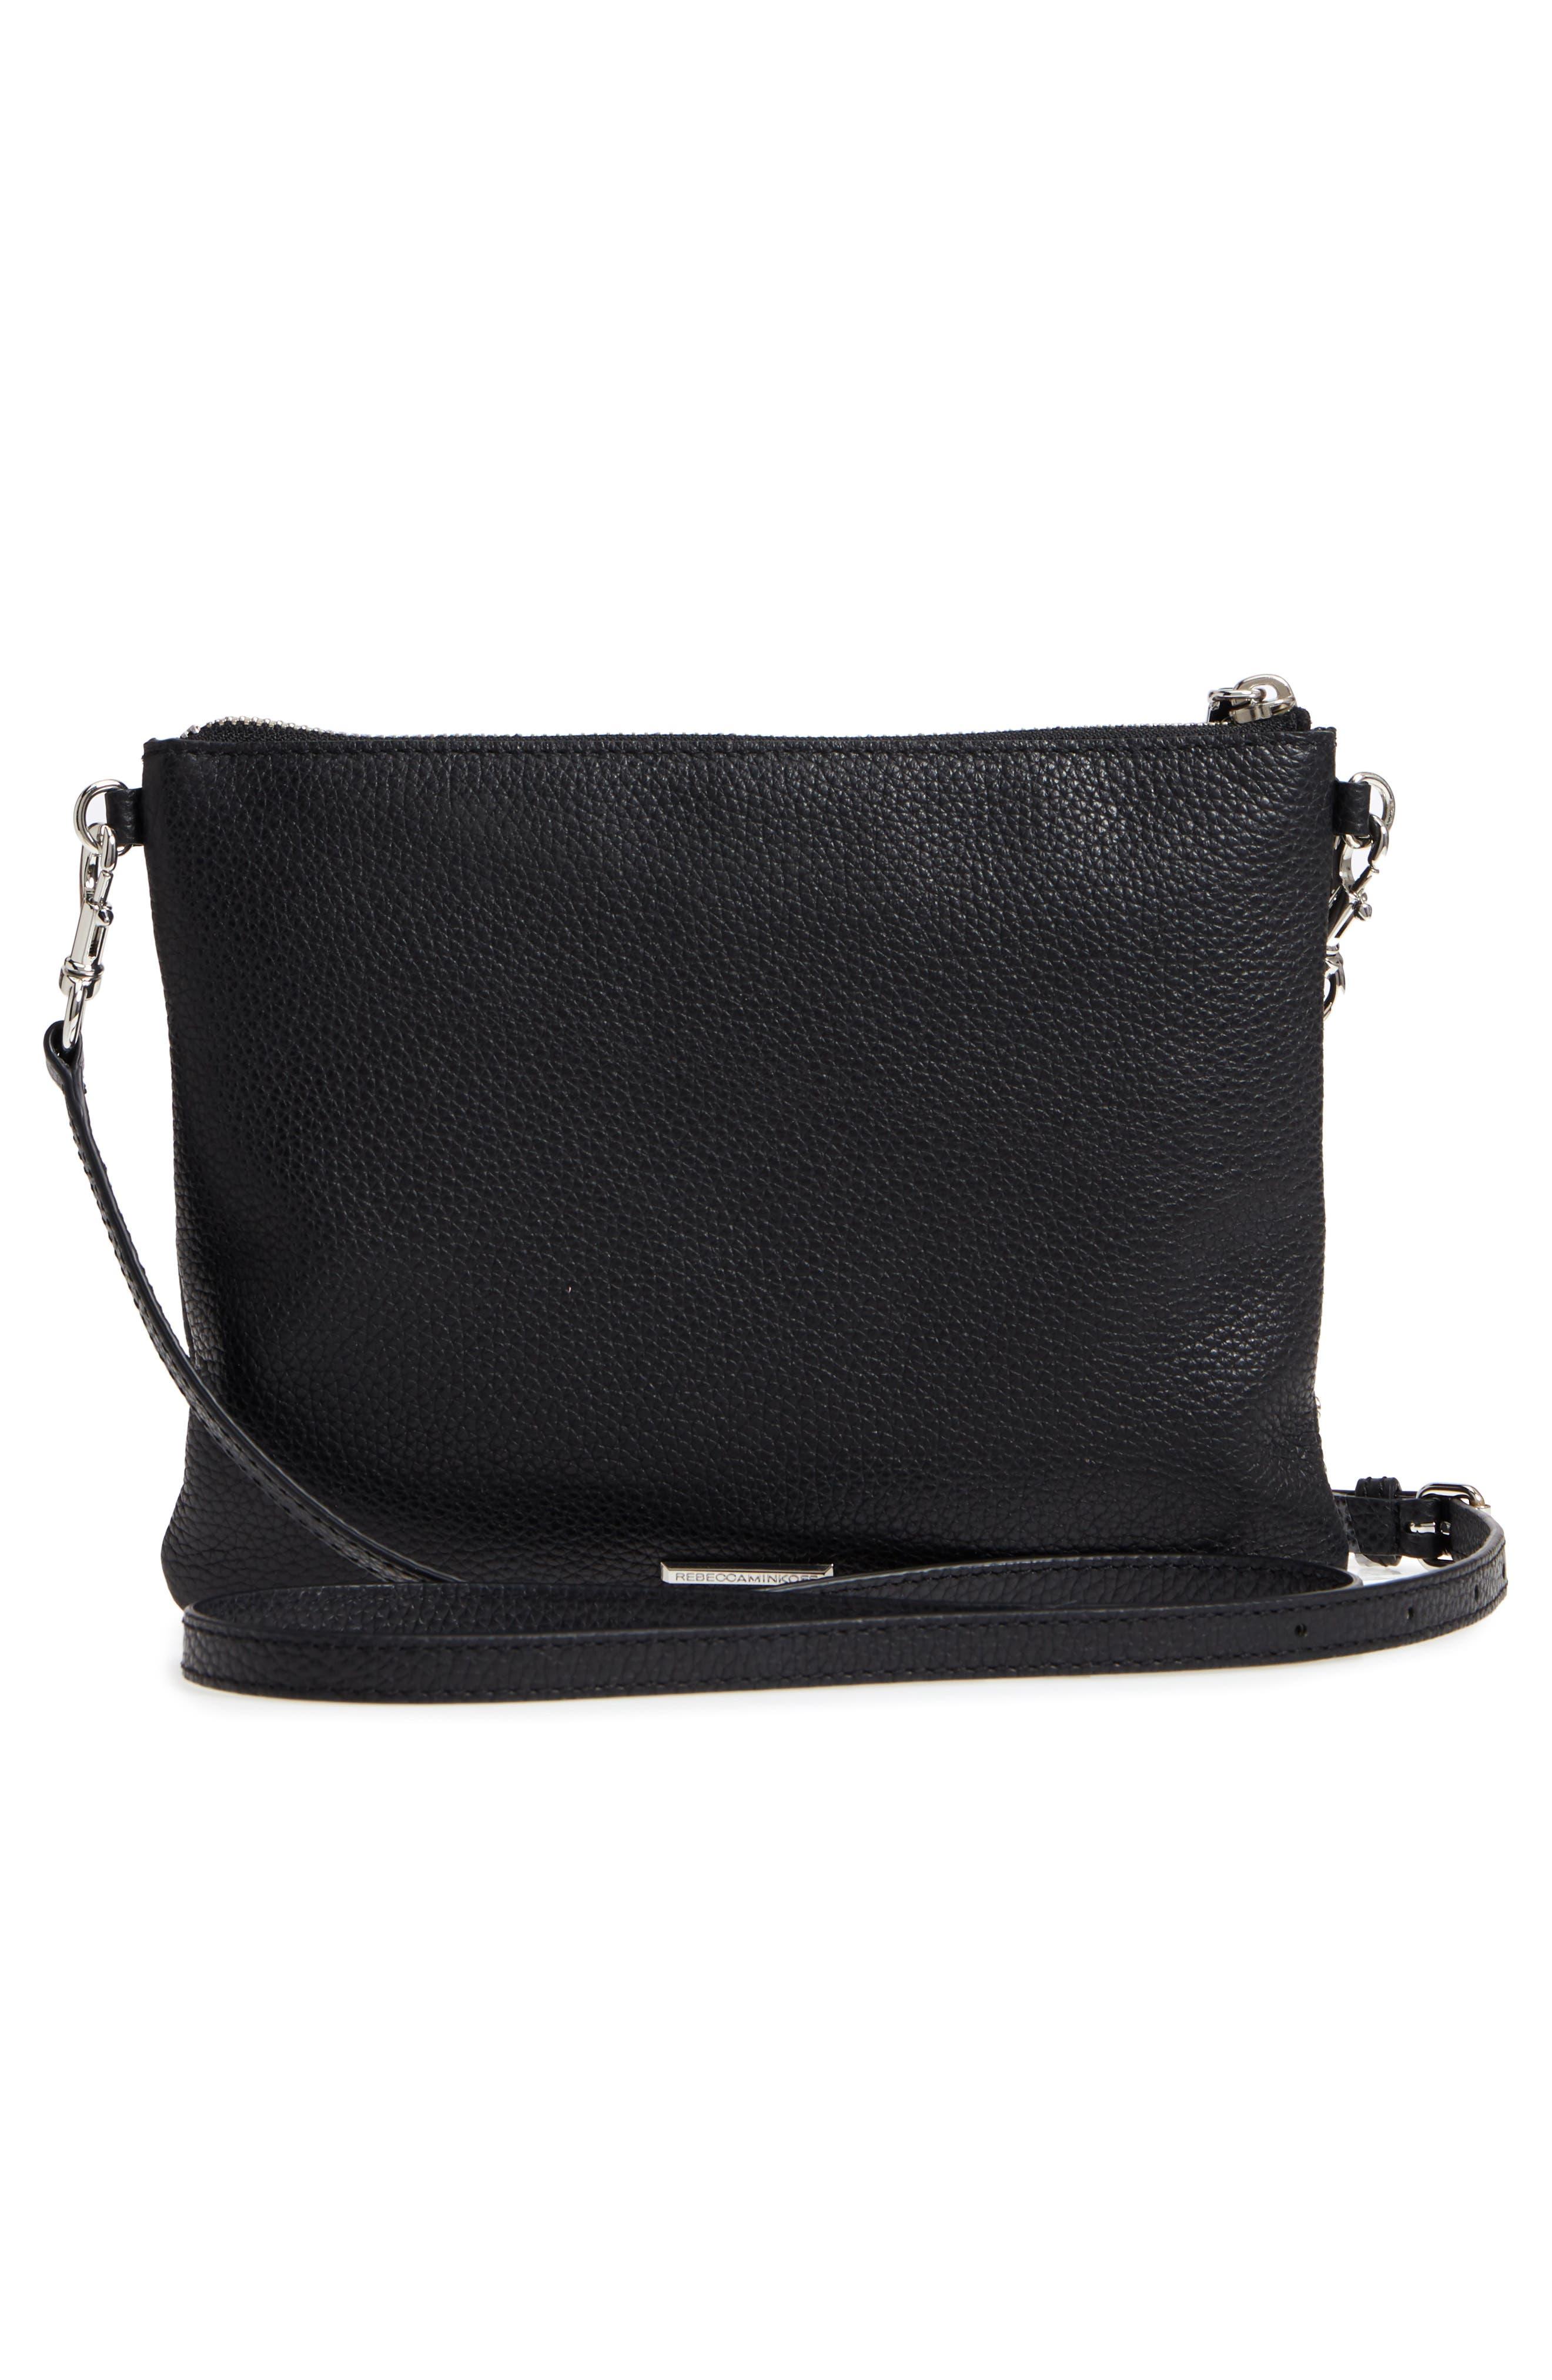 Jon Studded Leather Crossbody Bag,                             Alternate thumbnail 3, color,                             001